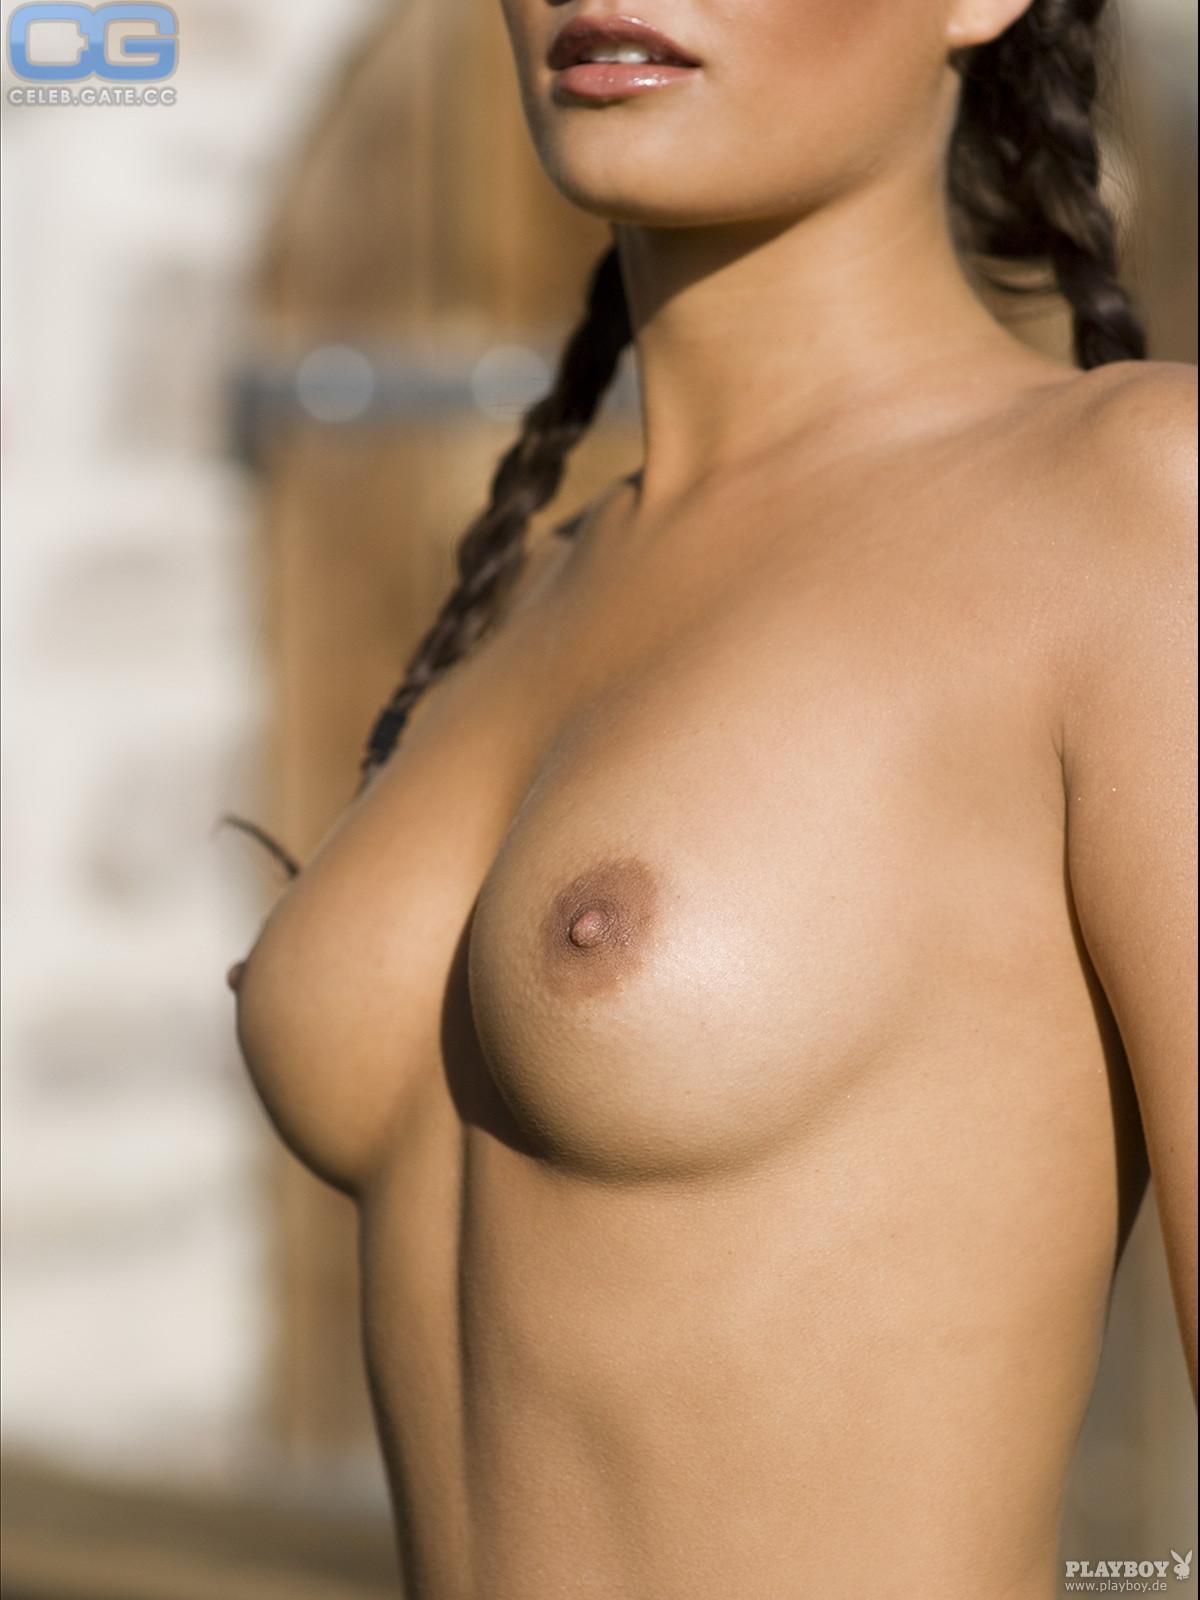 Nude anna scharl Browse arkadel's